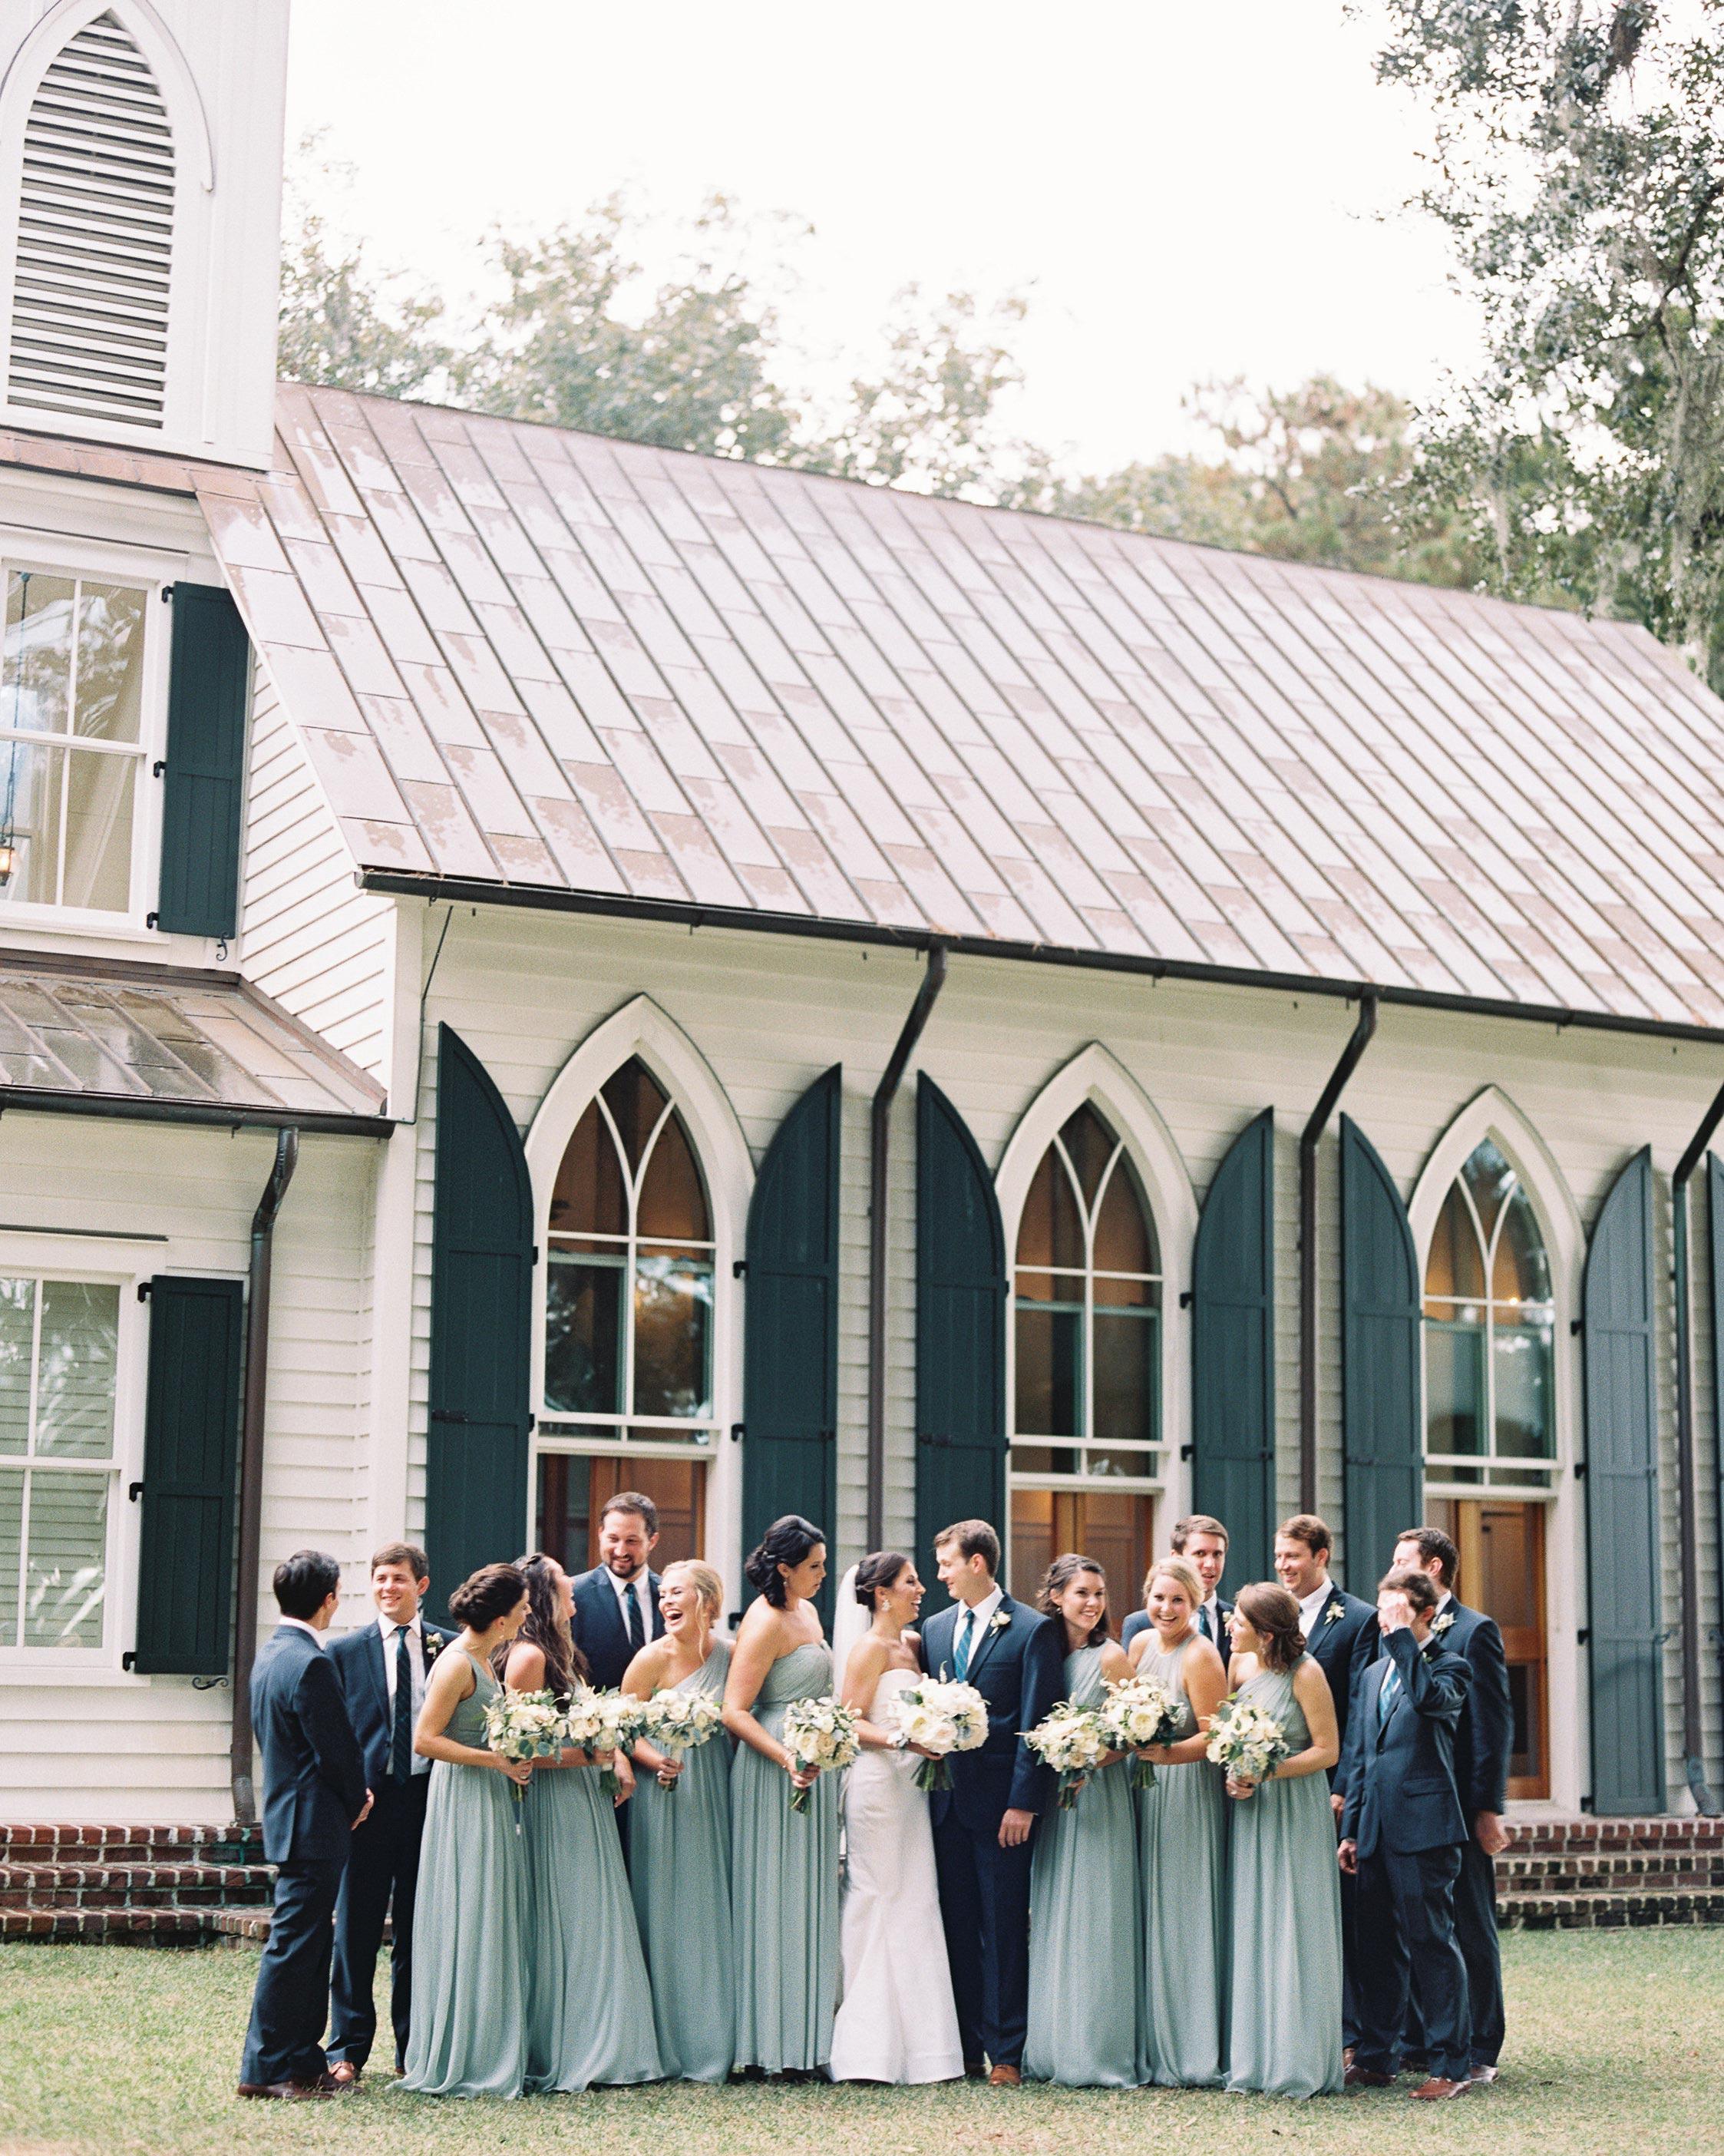 taylor-john-wedding-bridal-party-50-s113035-0616.jpg